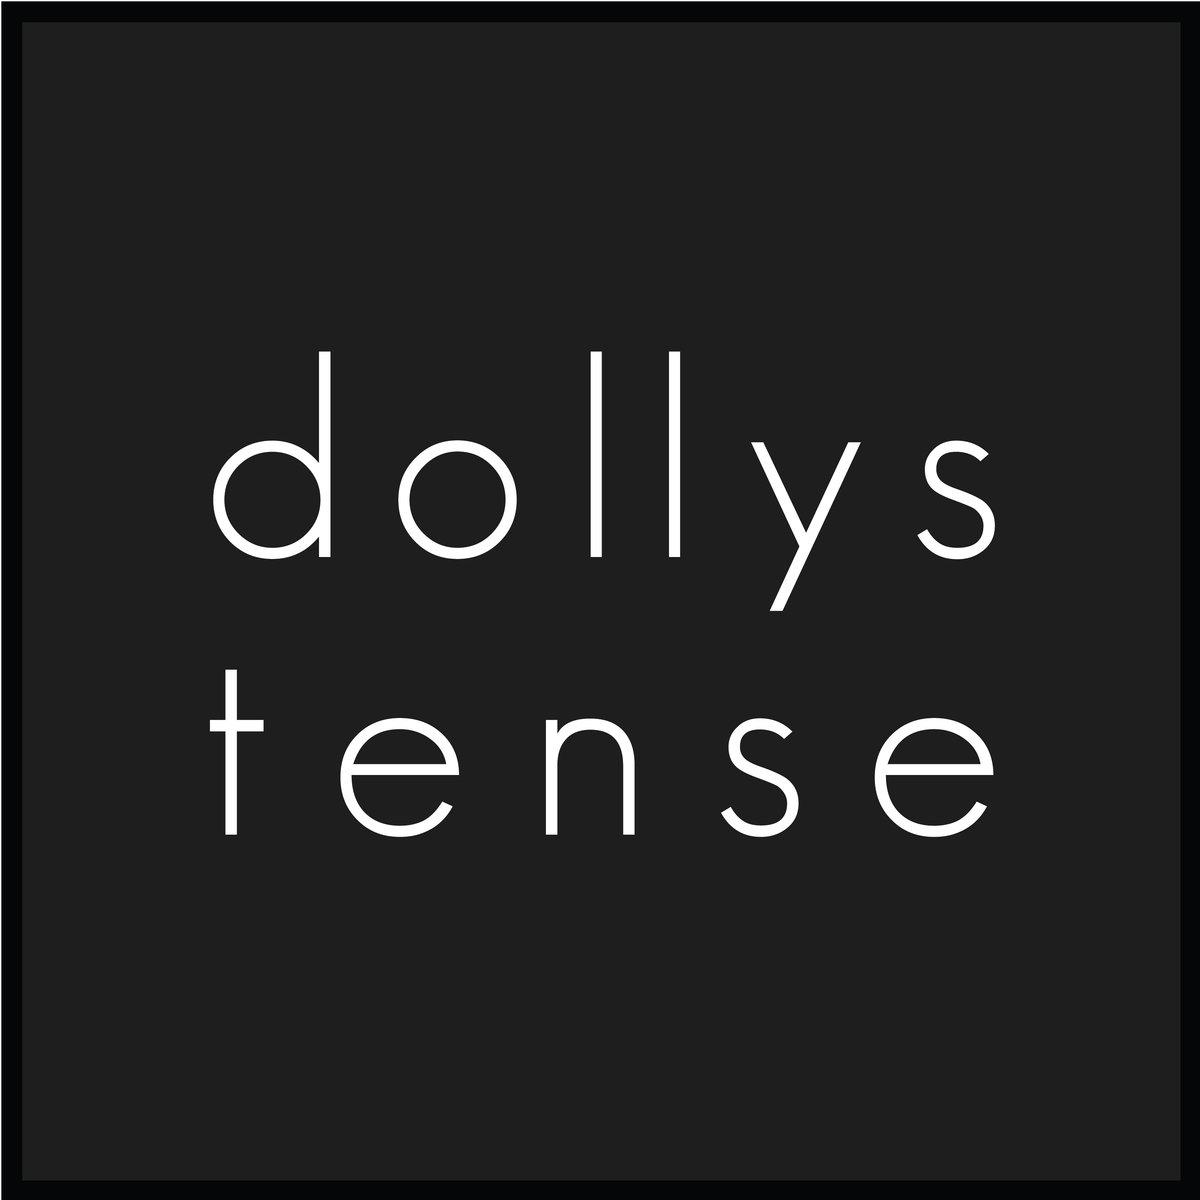 dollys, <i>tense</i>, 2017   CoolDad Music